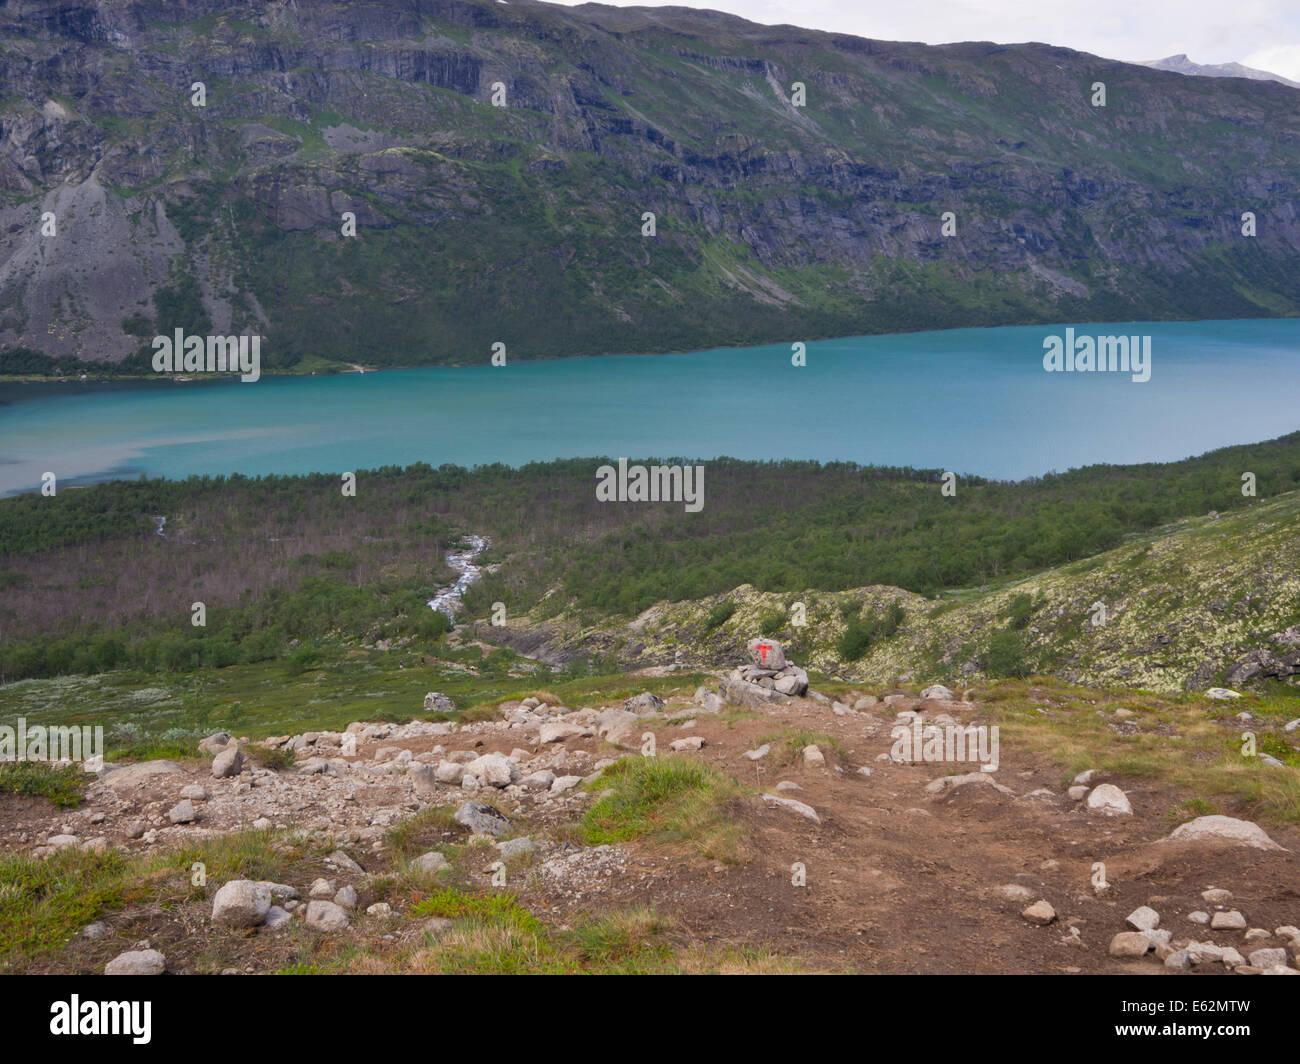 Jotunheimen National Park Norway, looking down at lake Gjende  from Svartdalen mountain pass - Stock Image